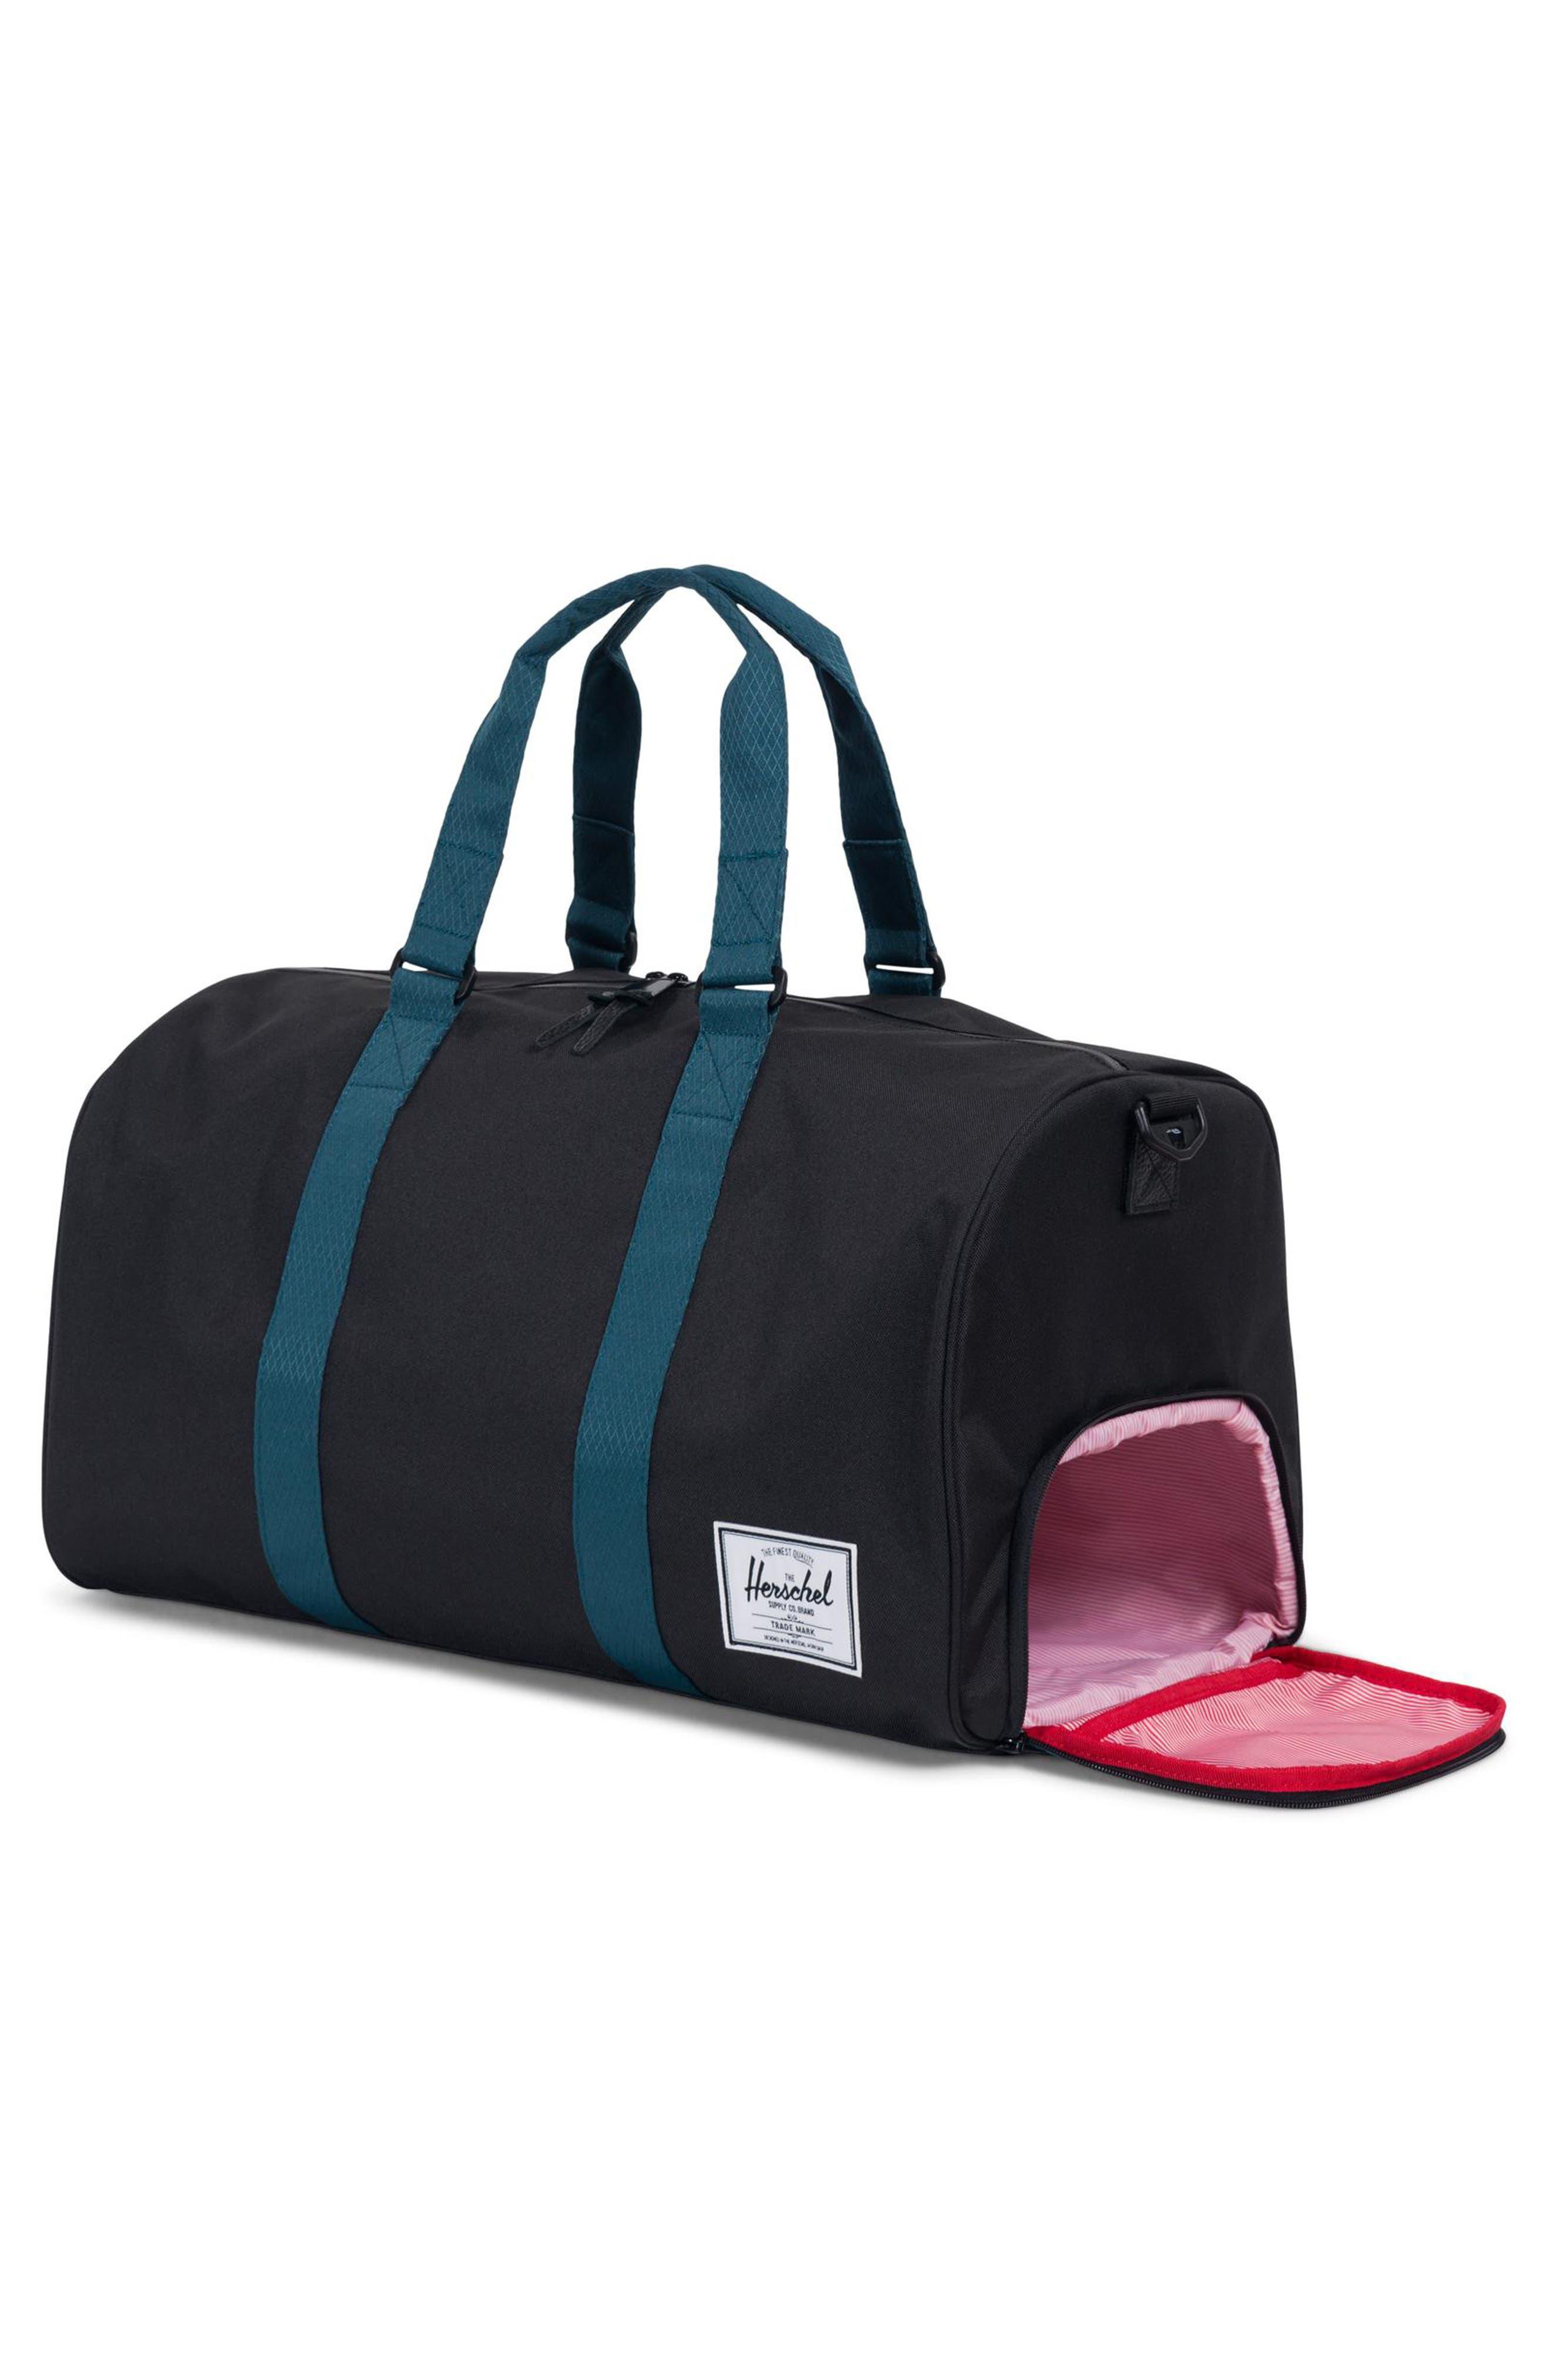 Novel Duffel Bag,                             Alternate thumbnail 3, color,                             BLACK/ DEEP TEAL